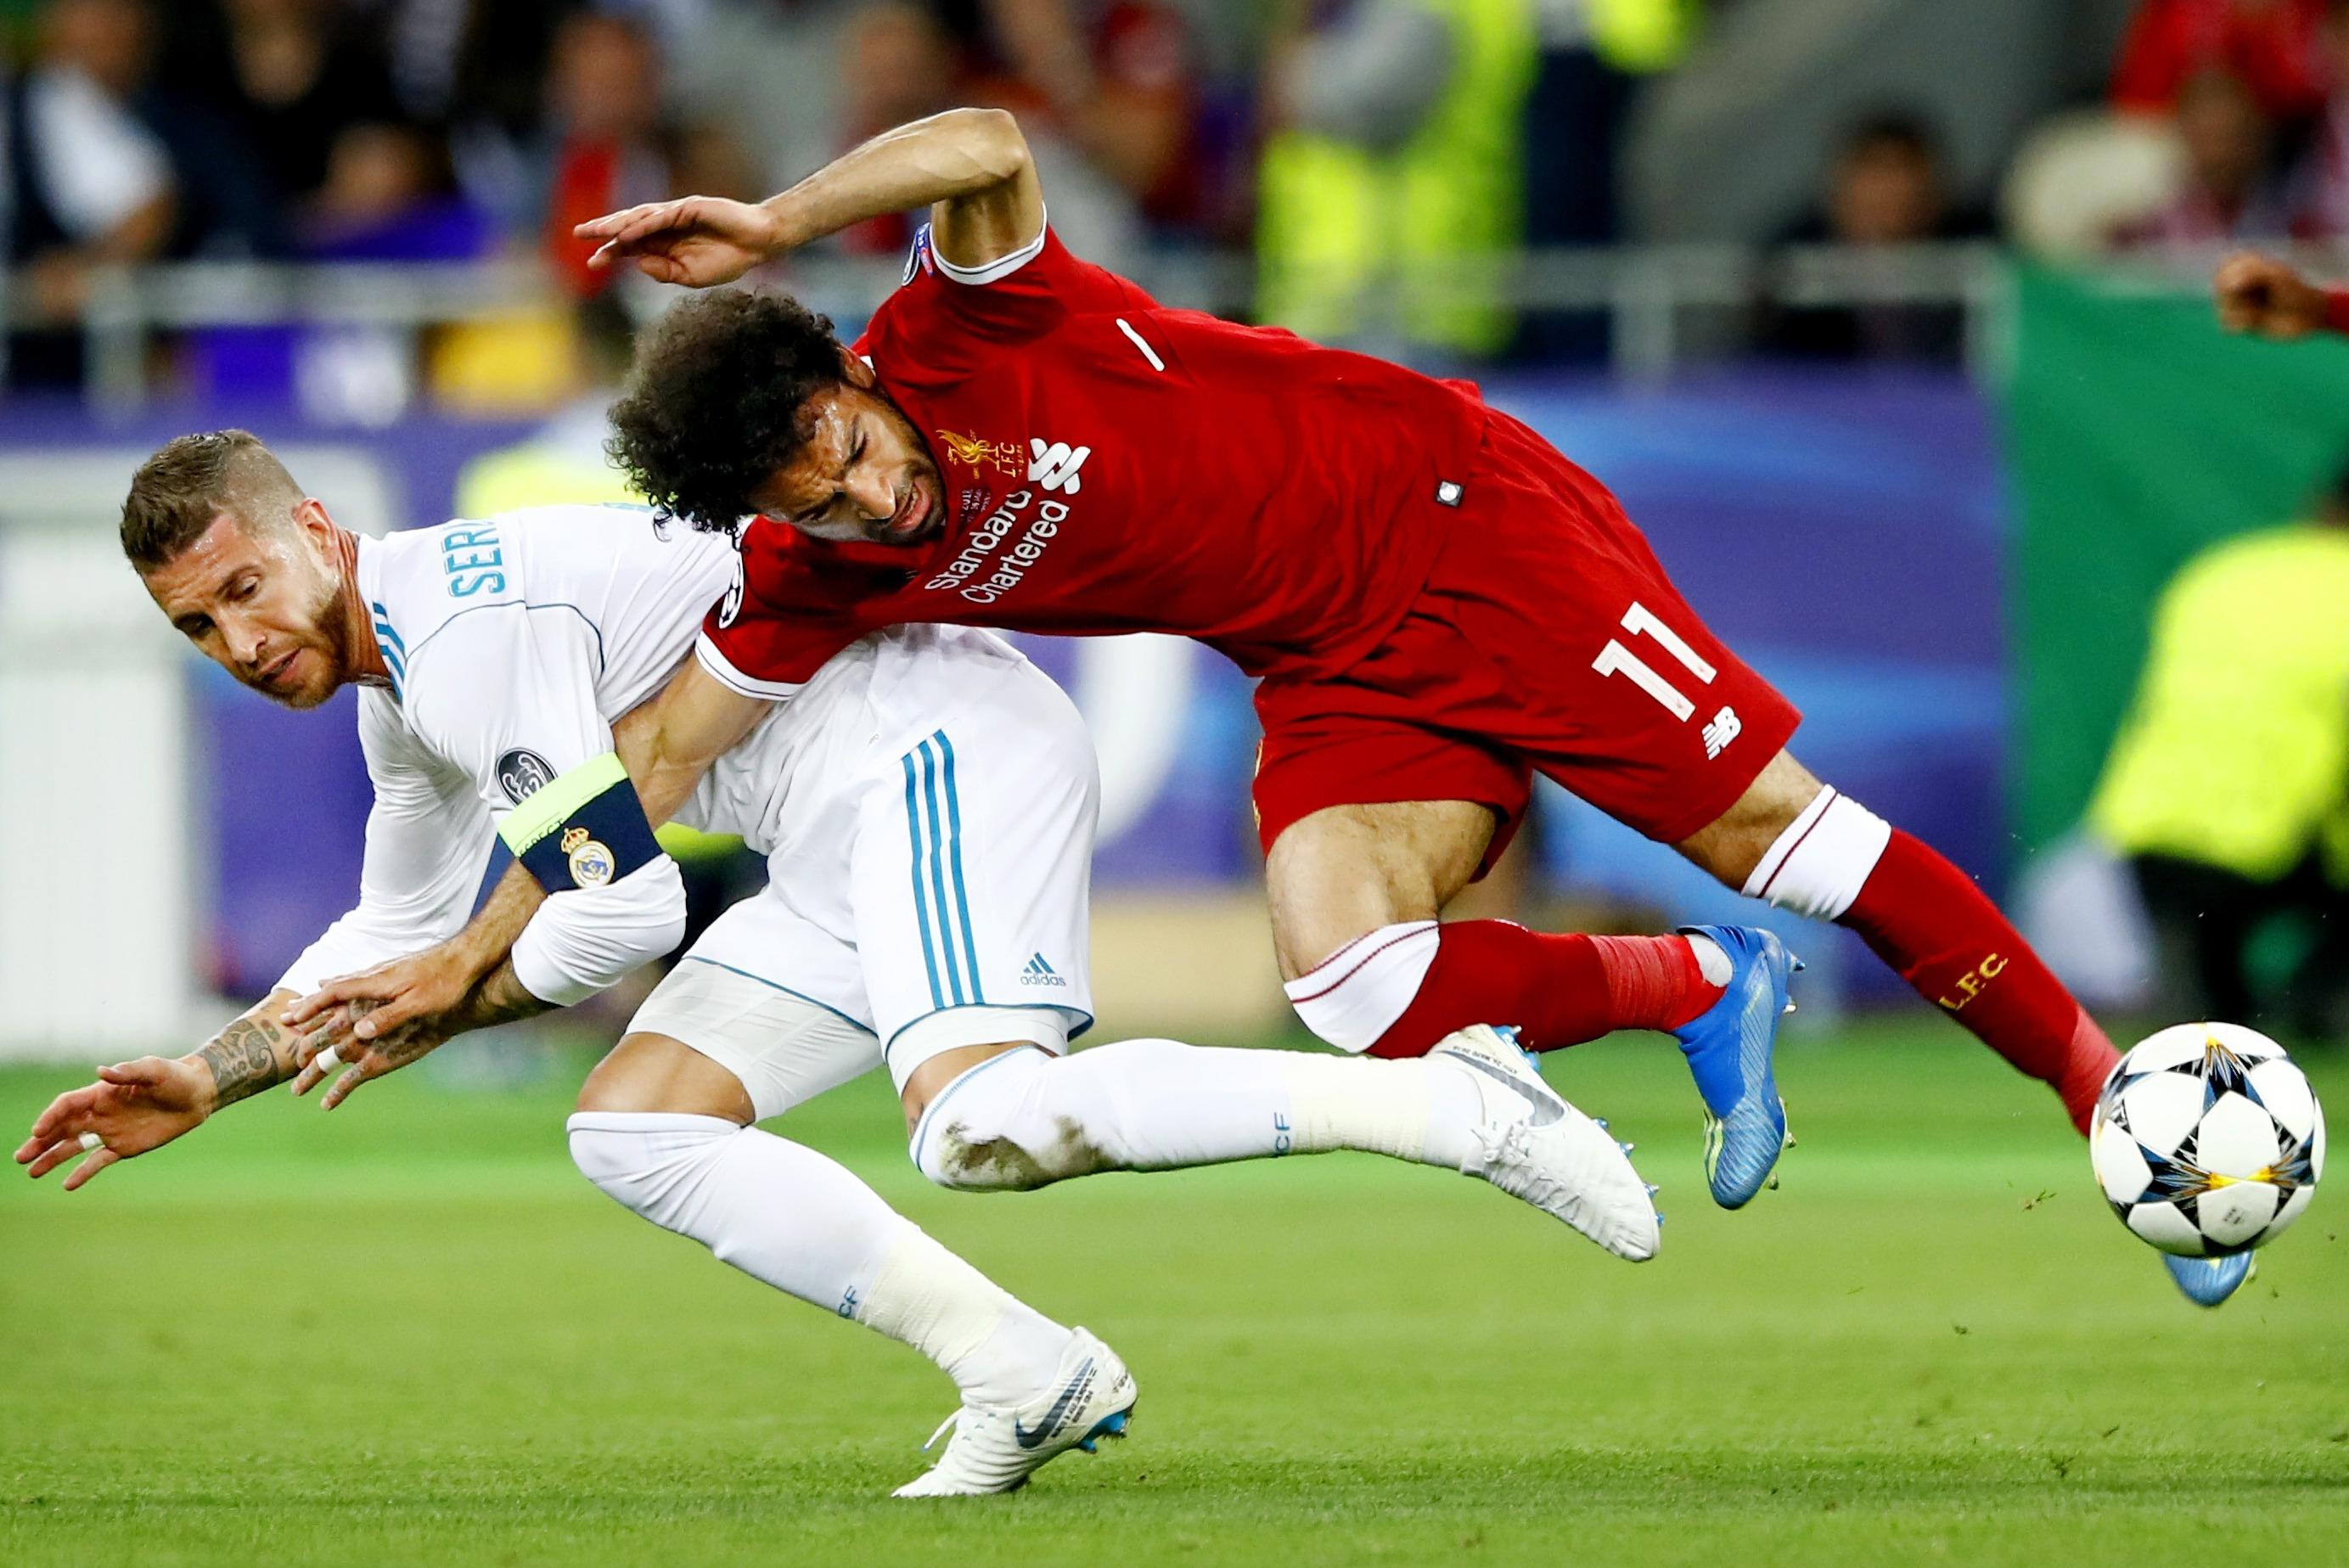 Injuring Salah in Champions League final was a Ramos masterstroke - Chiellini - Bóng Đá